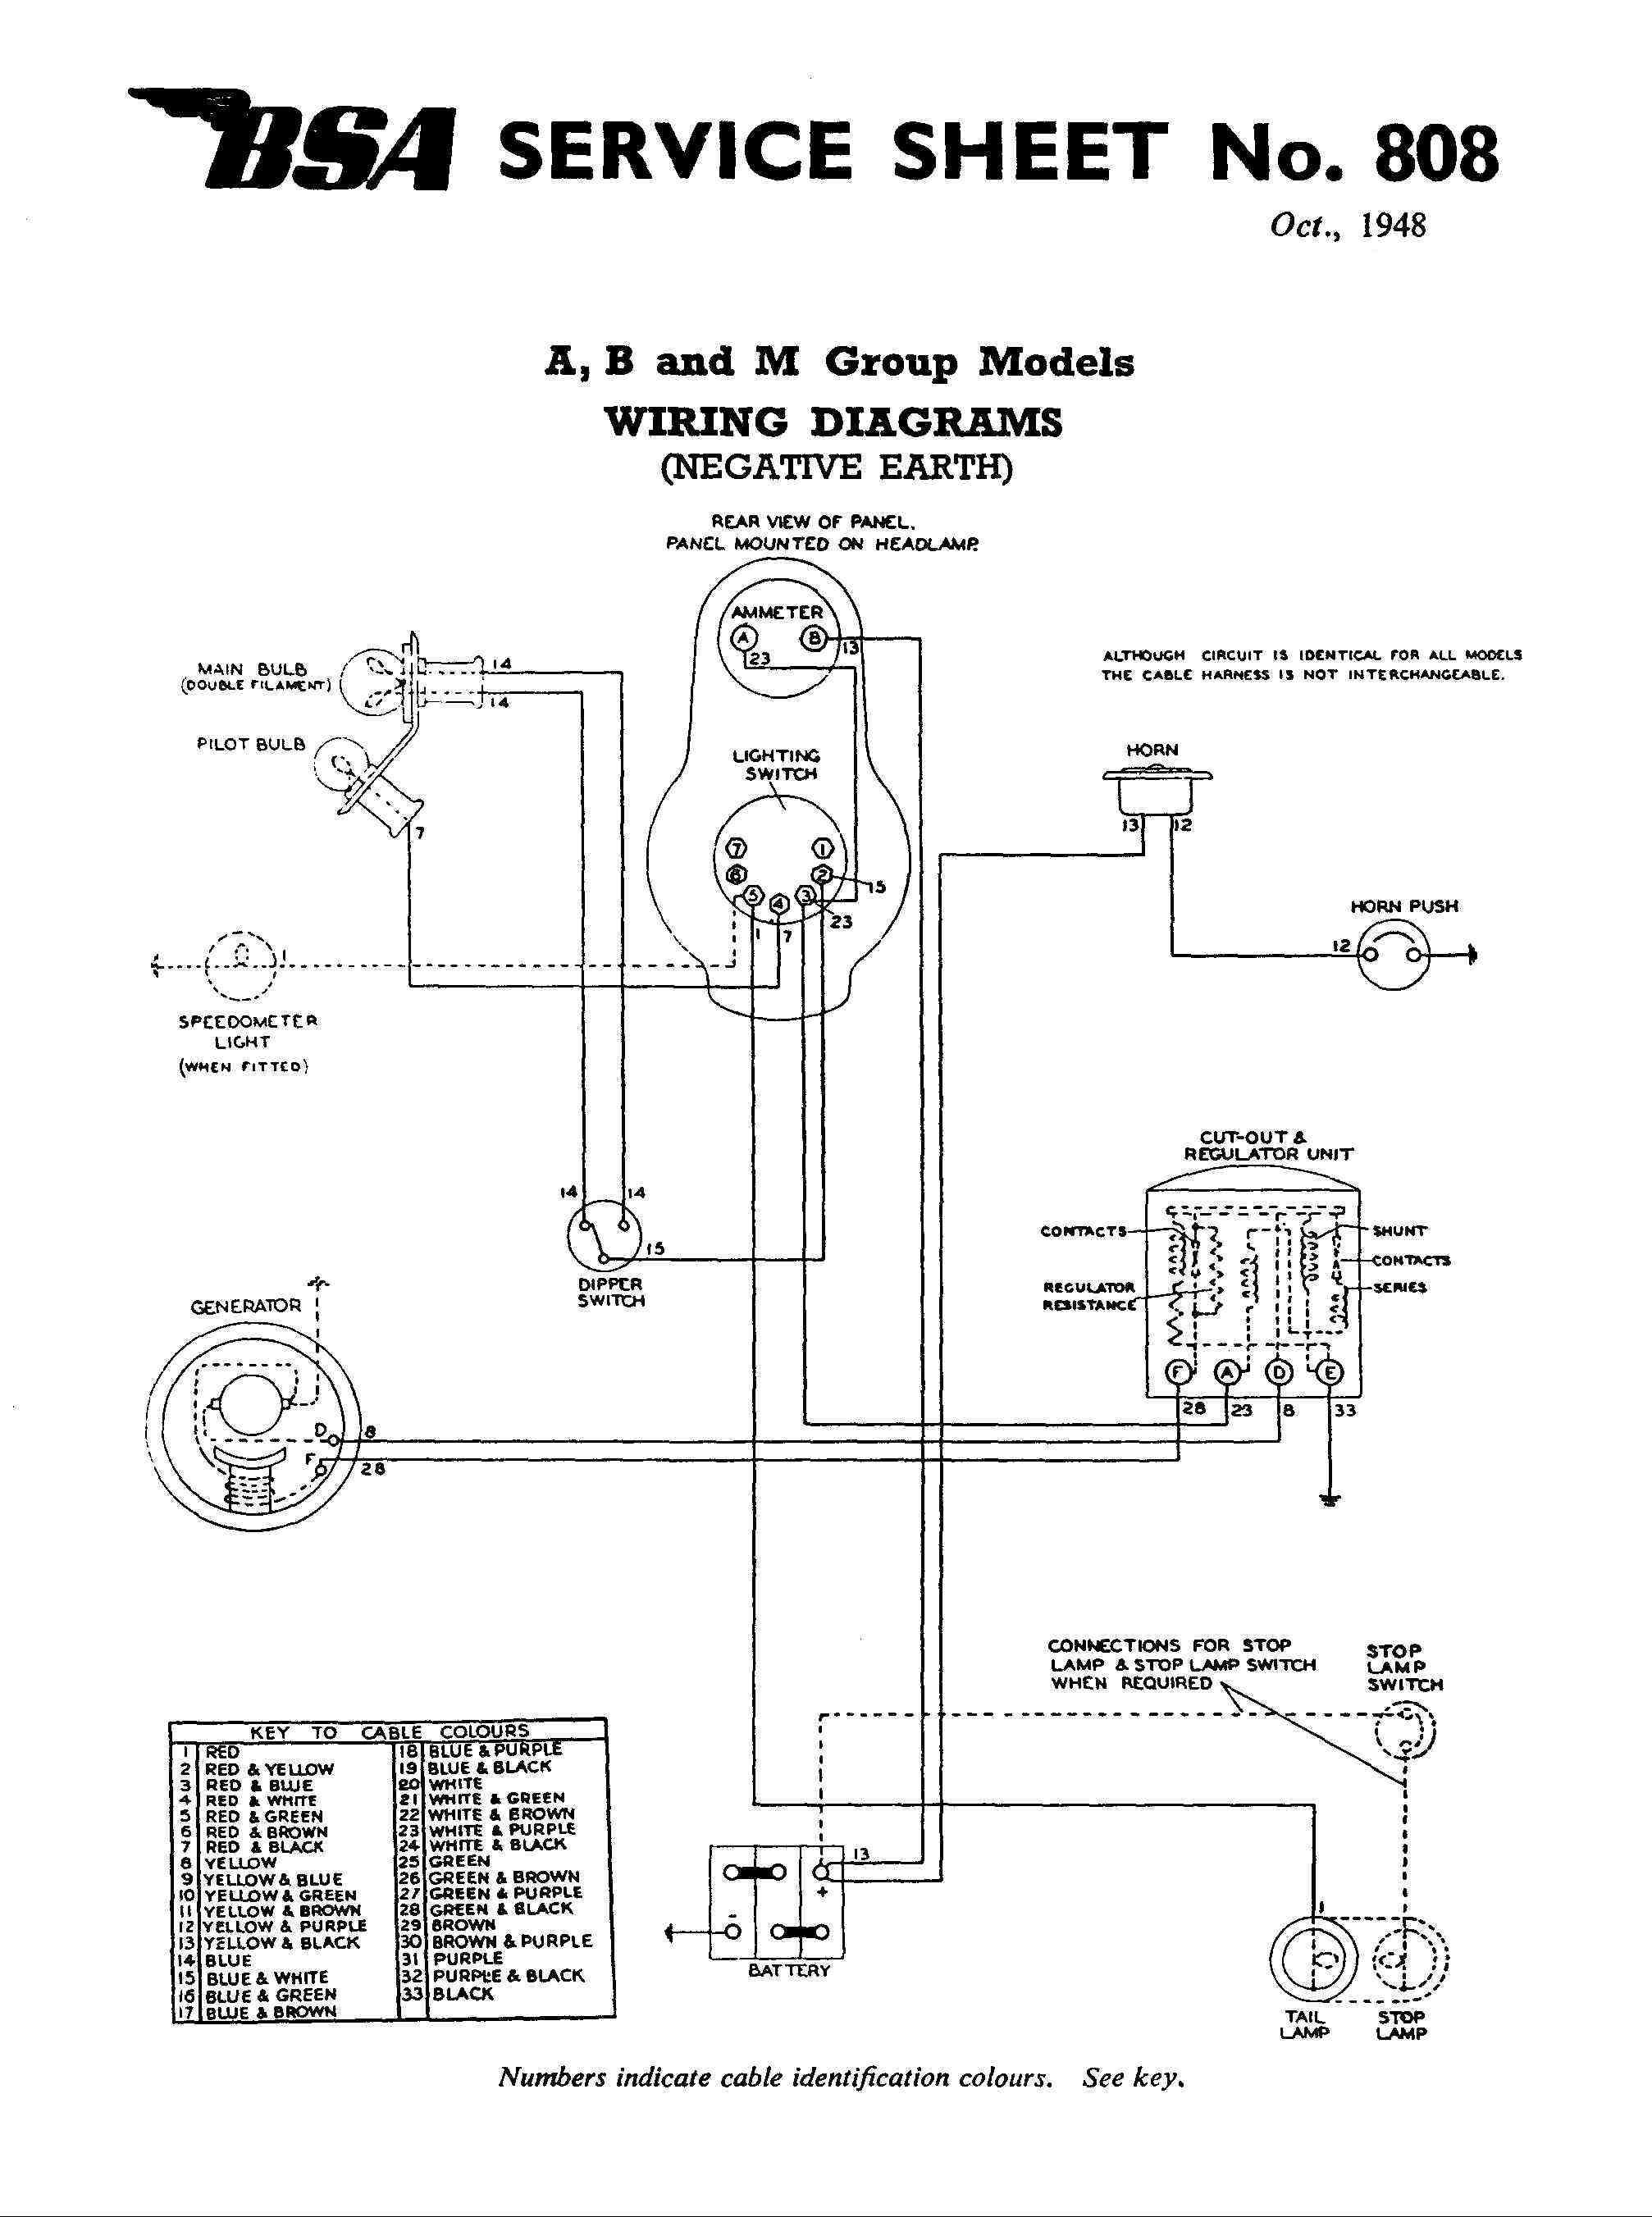 1968 bsa wiring diagram wiring diagram database BSA Firebird Scrambler 1968 bsa 441 wiring diagram wiring diagram online 1968 bsa wiring diagram